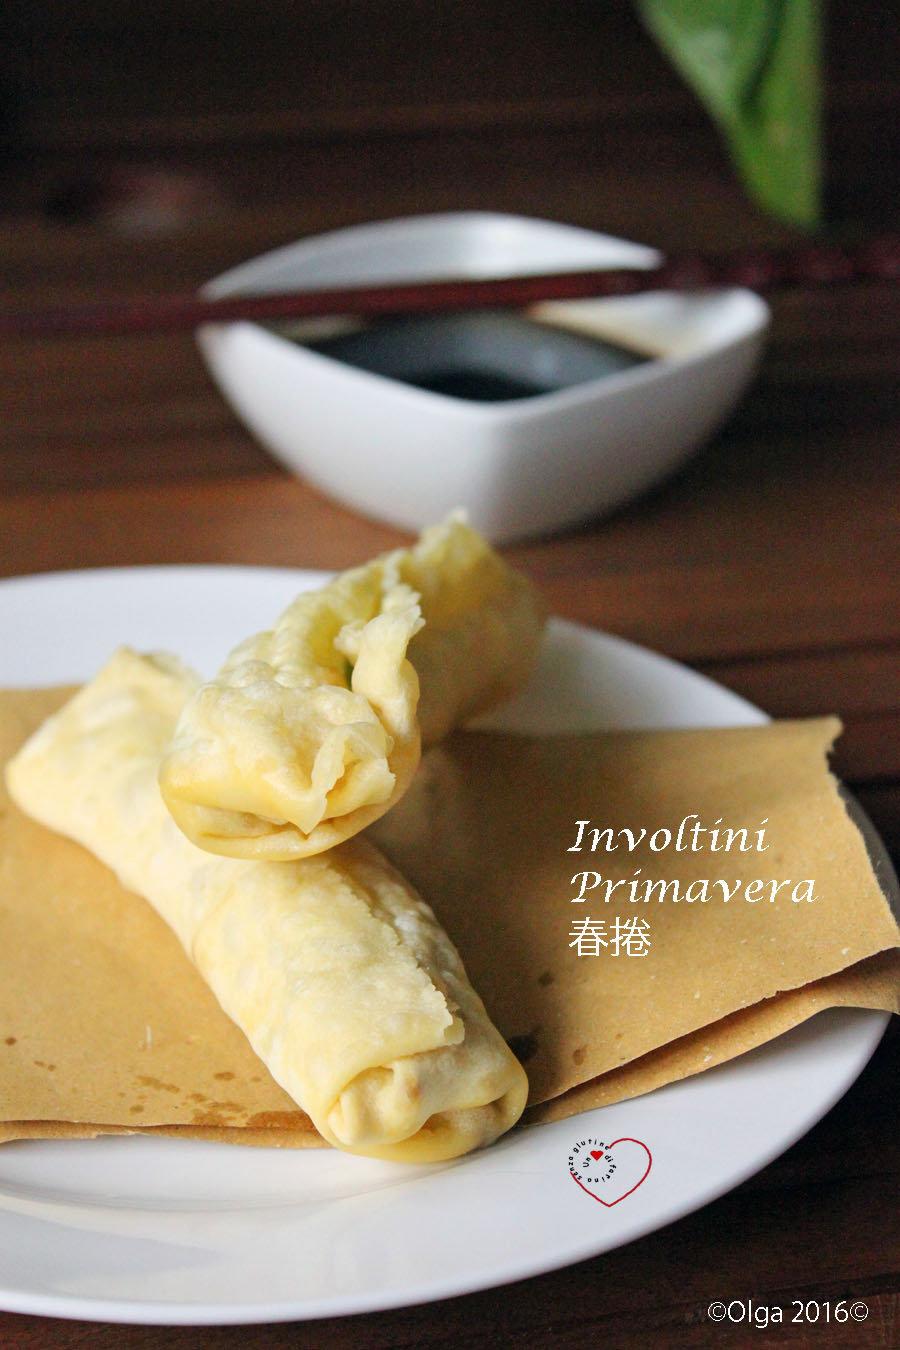 Involtini Primavera - Pasta Wonton